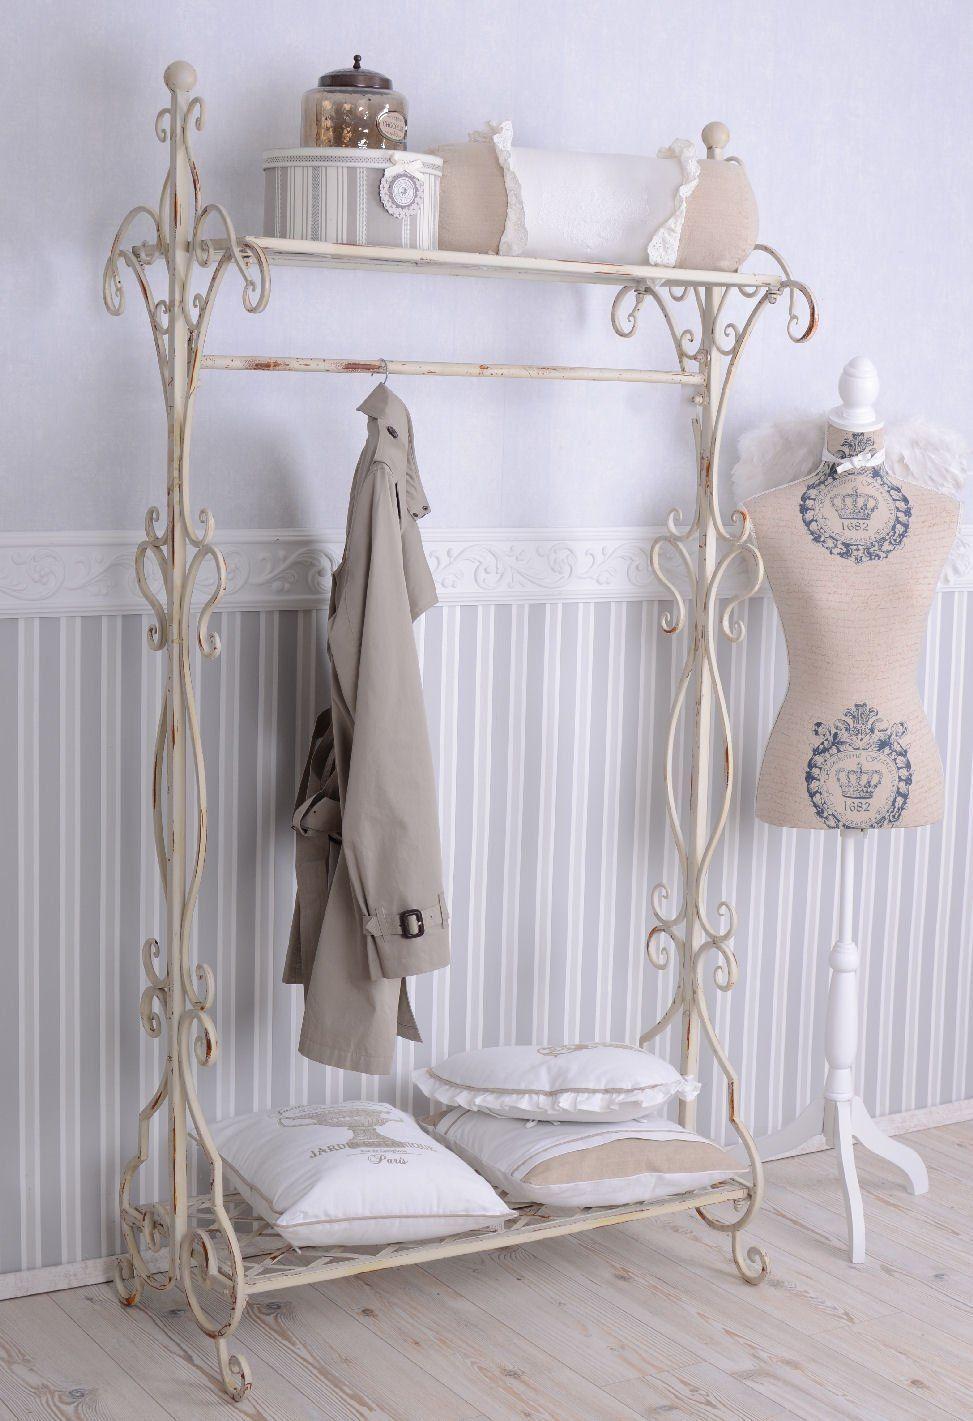 nostalgie garderobe shabby chic garderobenst nder weiss metallst nder k che. Black Bedroom Furniture Sets. Home Design Ideas